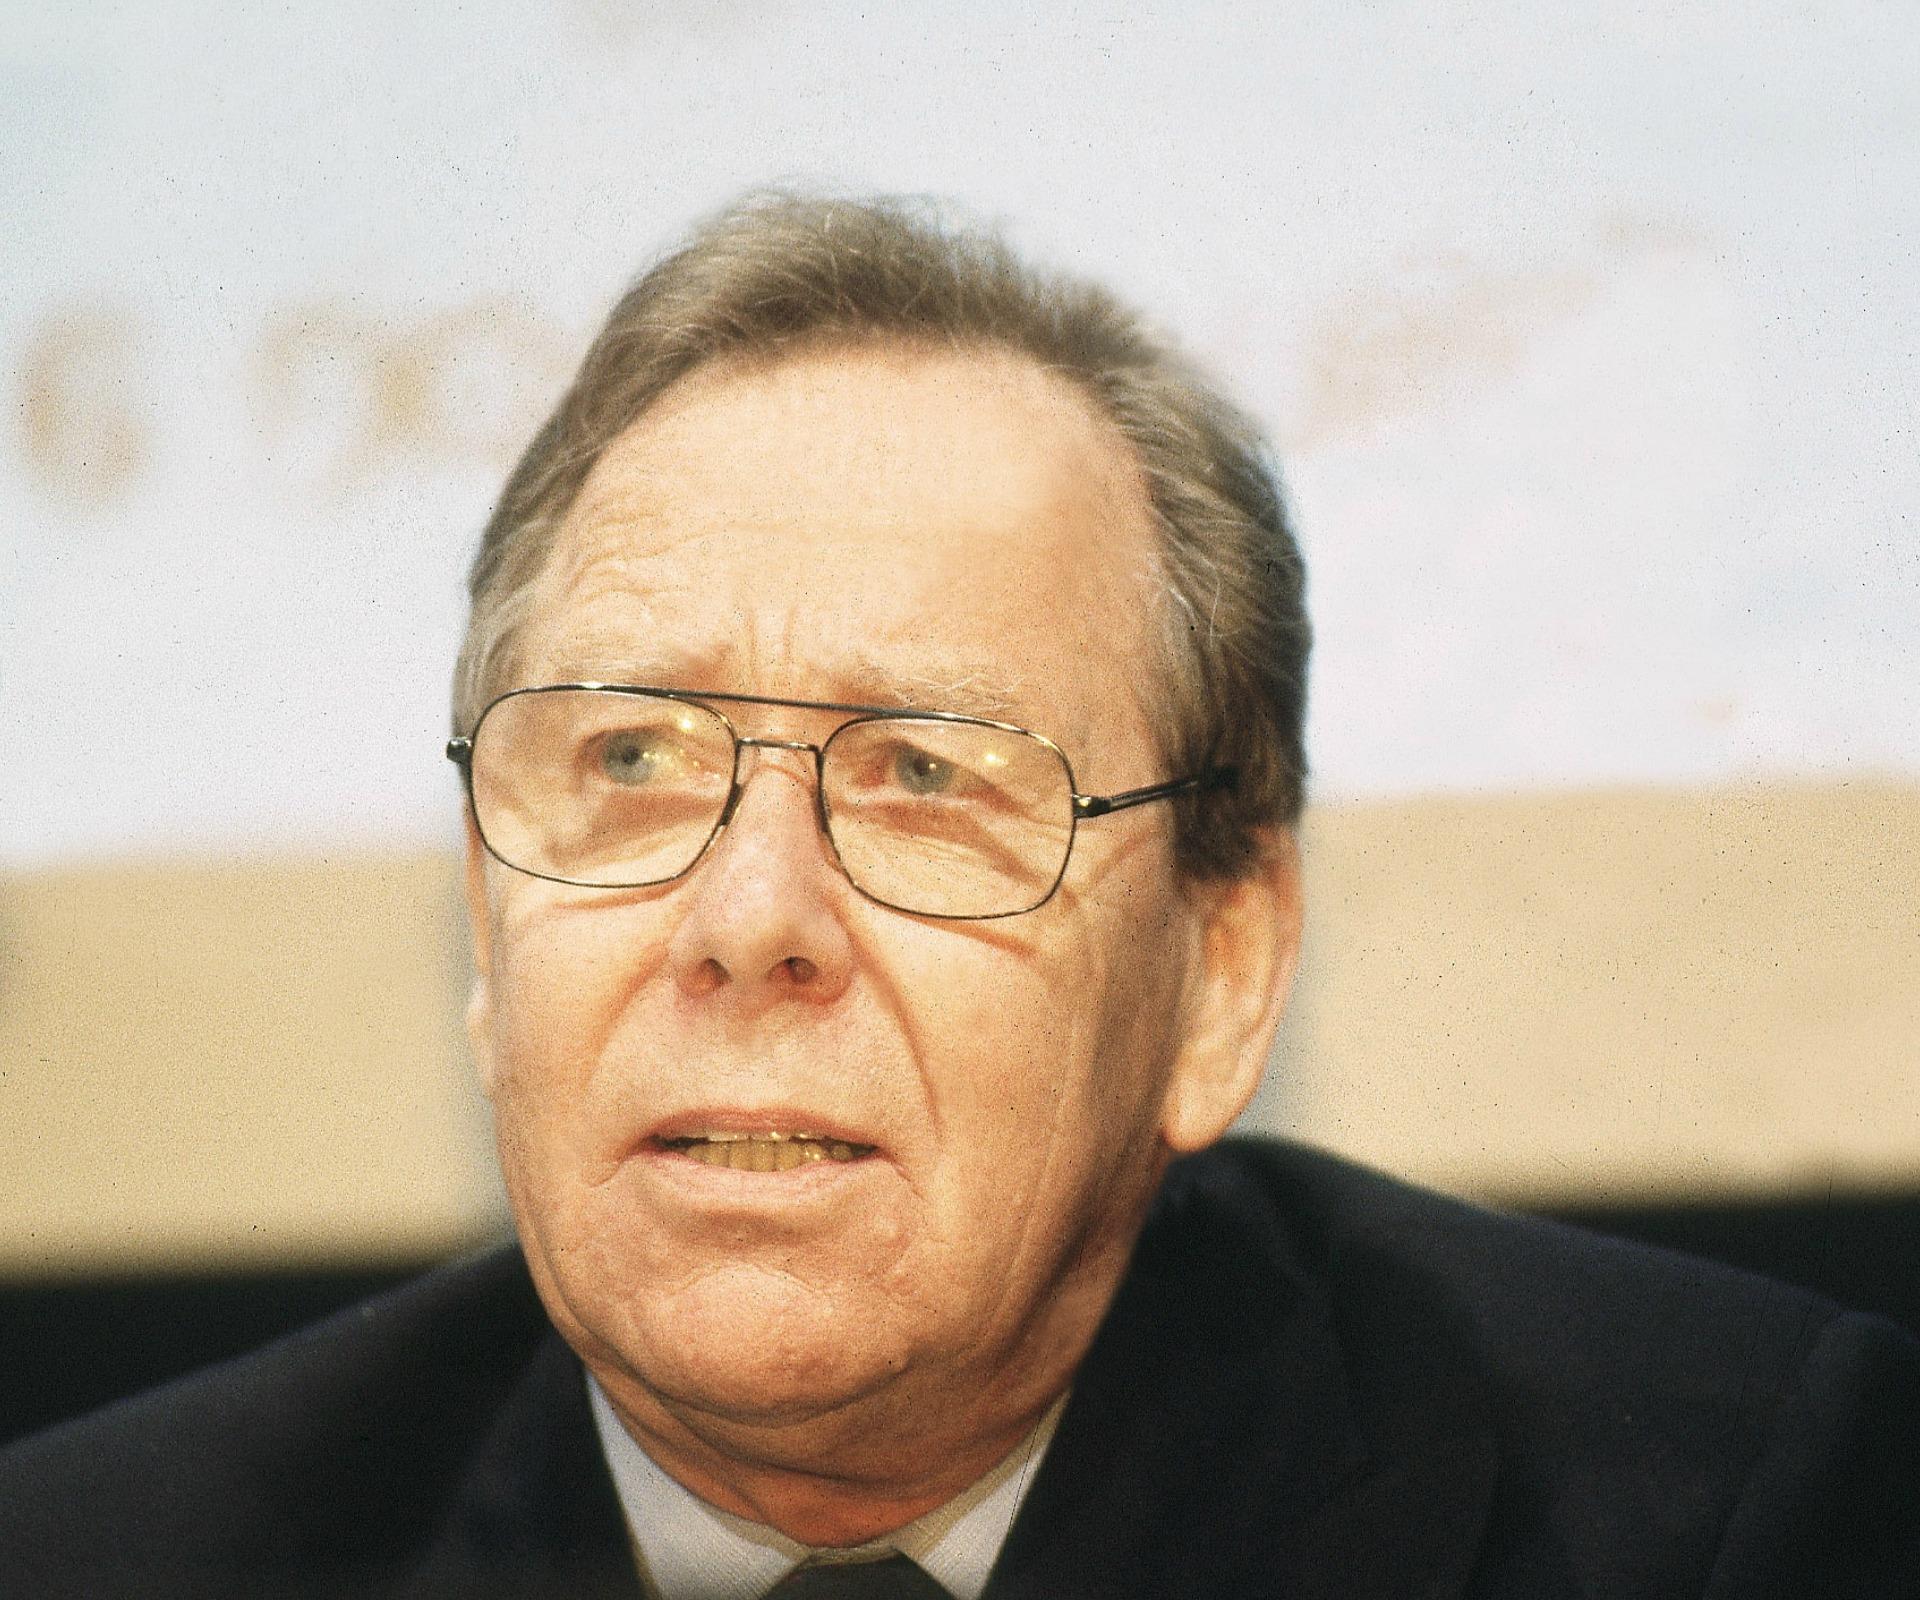 Princess Margaret's Former Husband Lord Snowdon Dies at 86